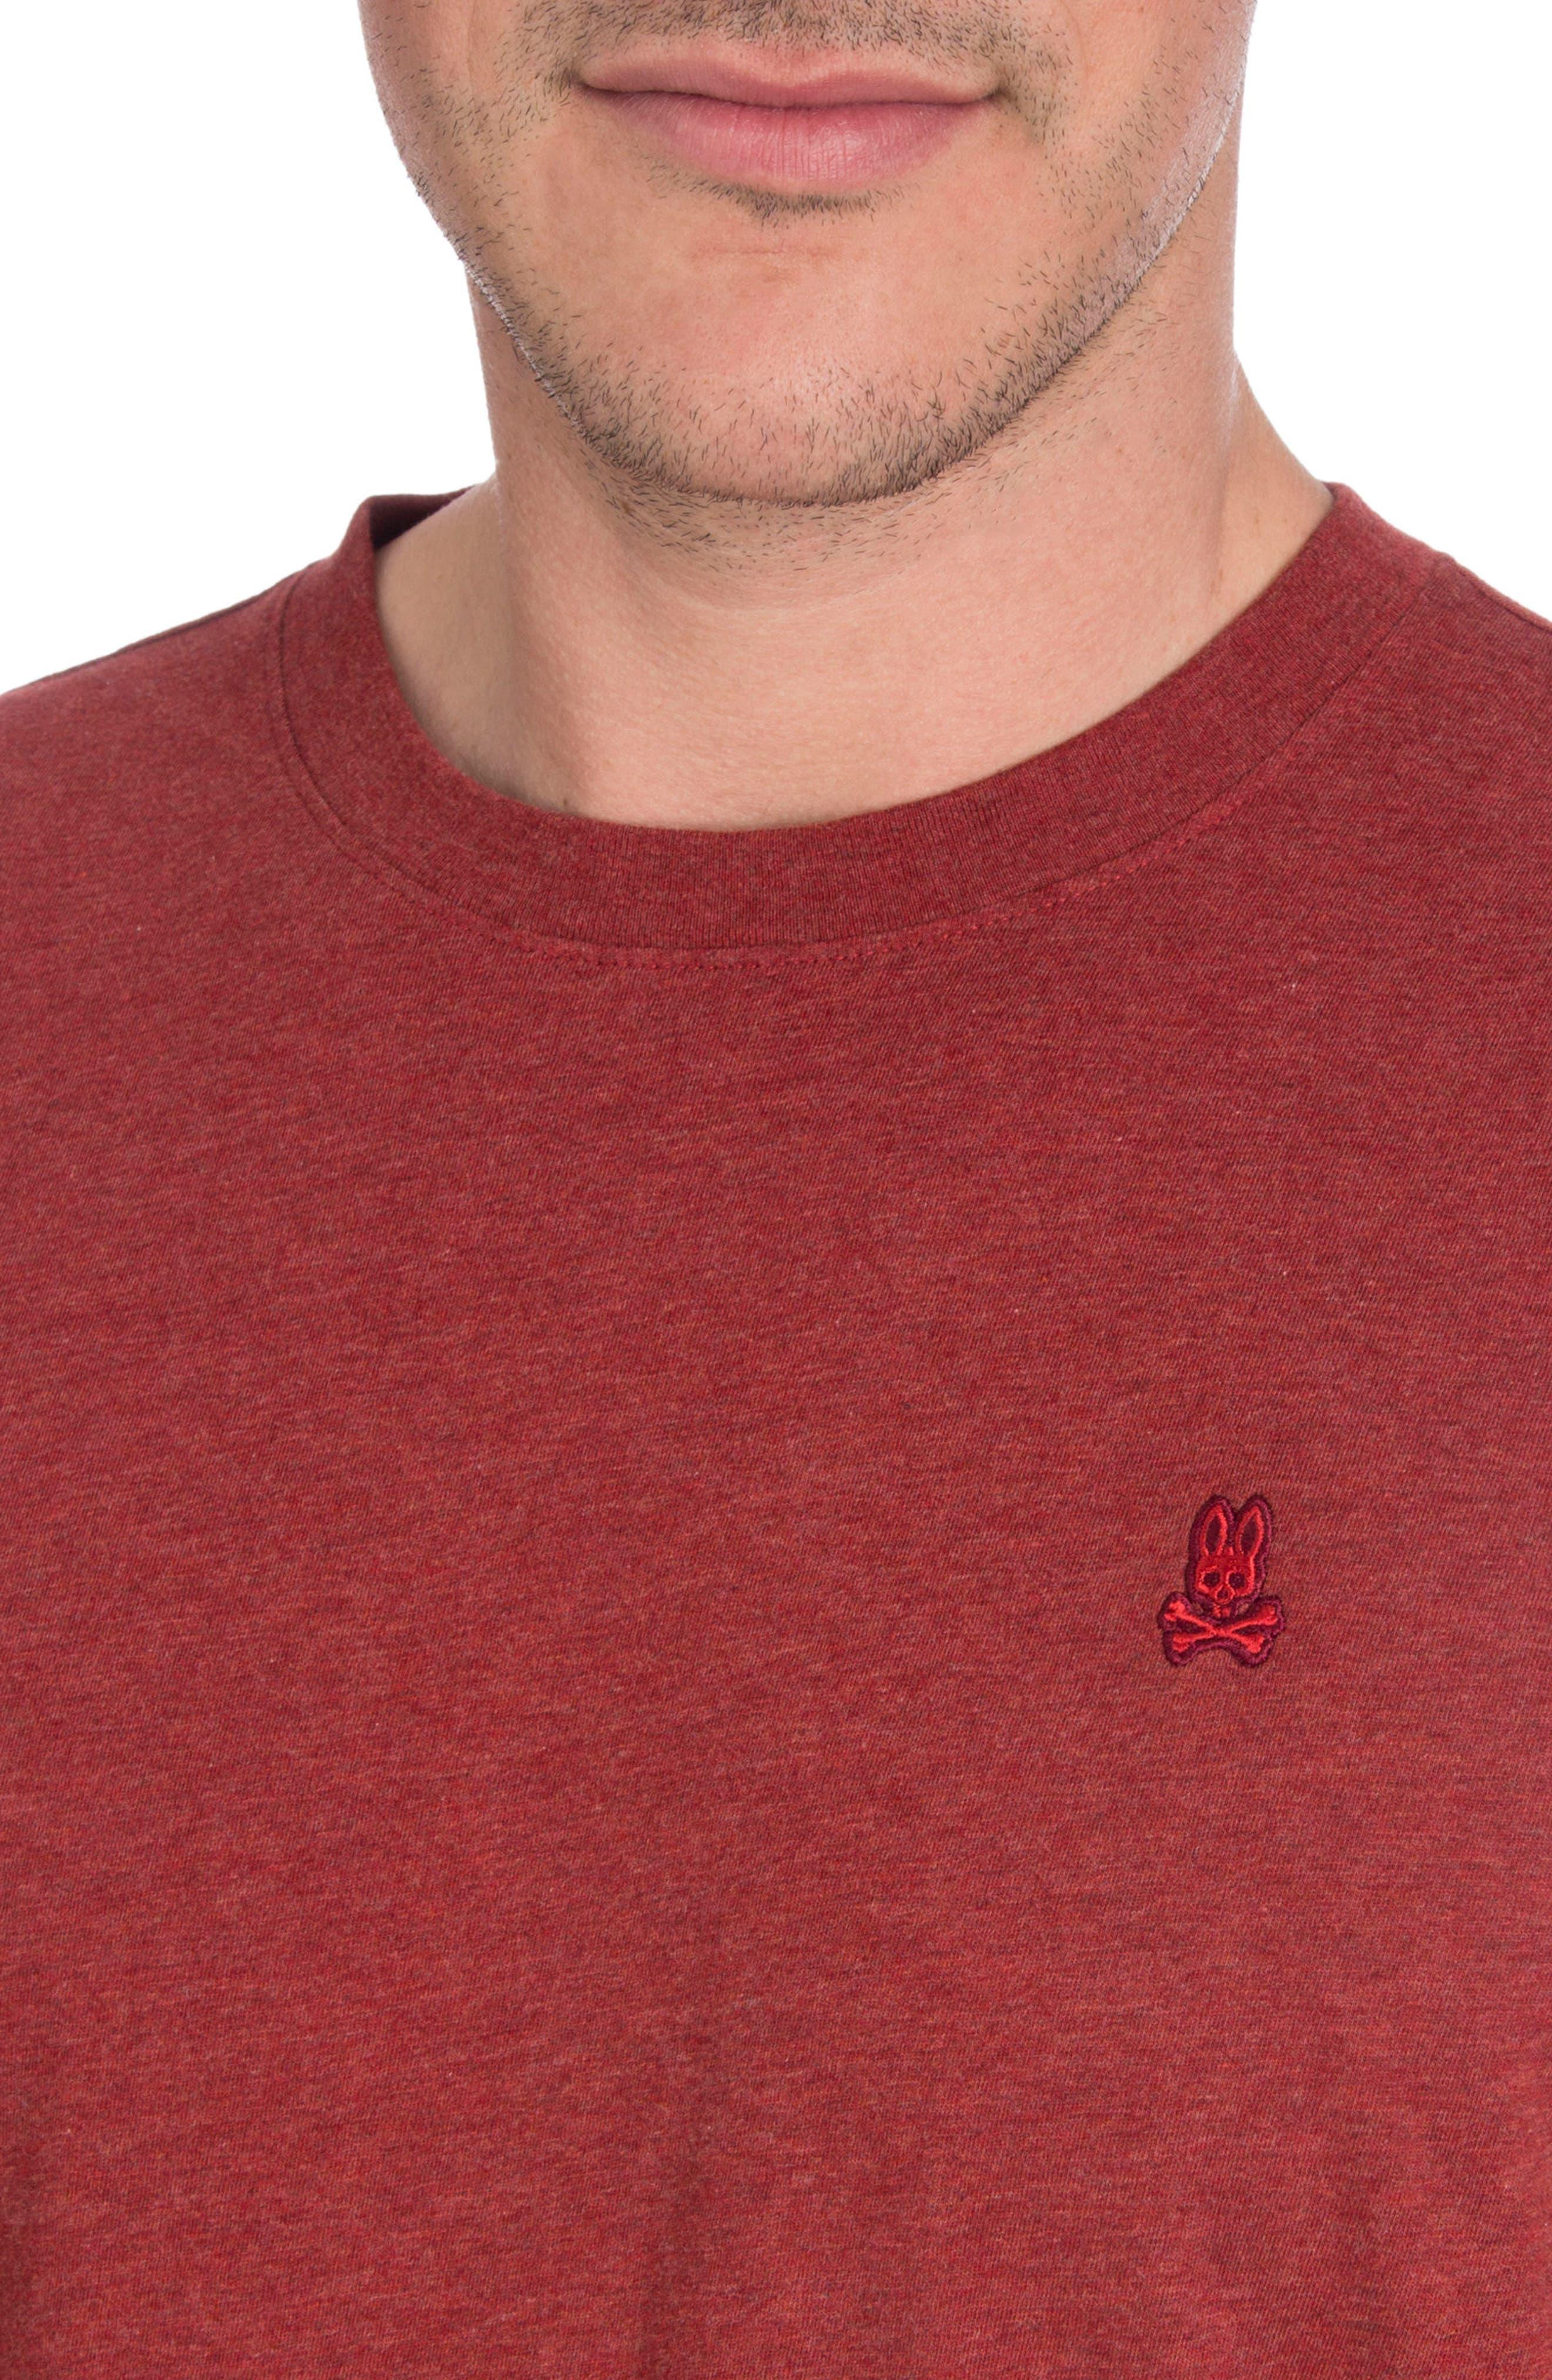 Long Sleeve T-Shirt,                             Alternate thumbnail 12, color,